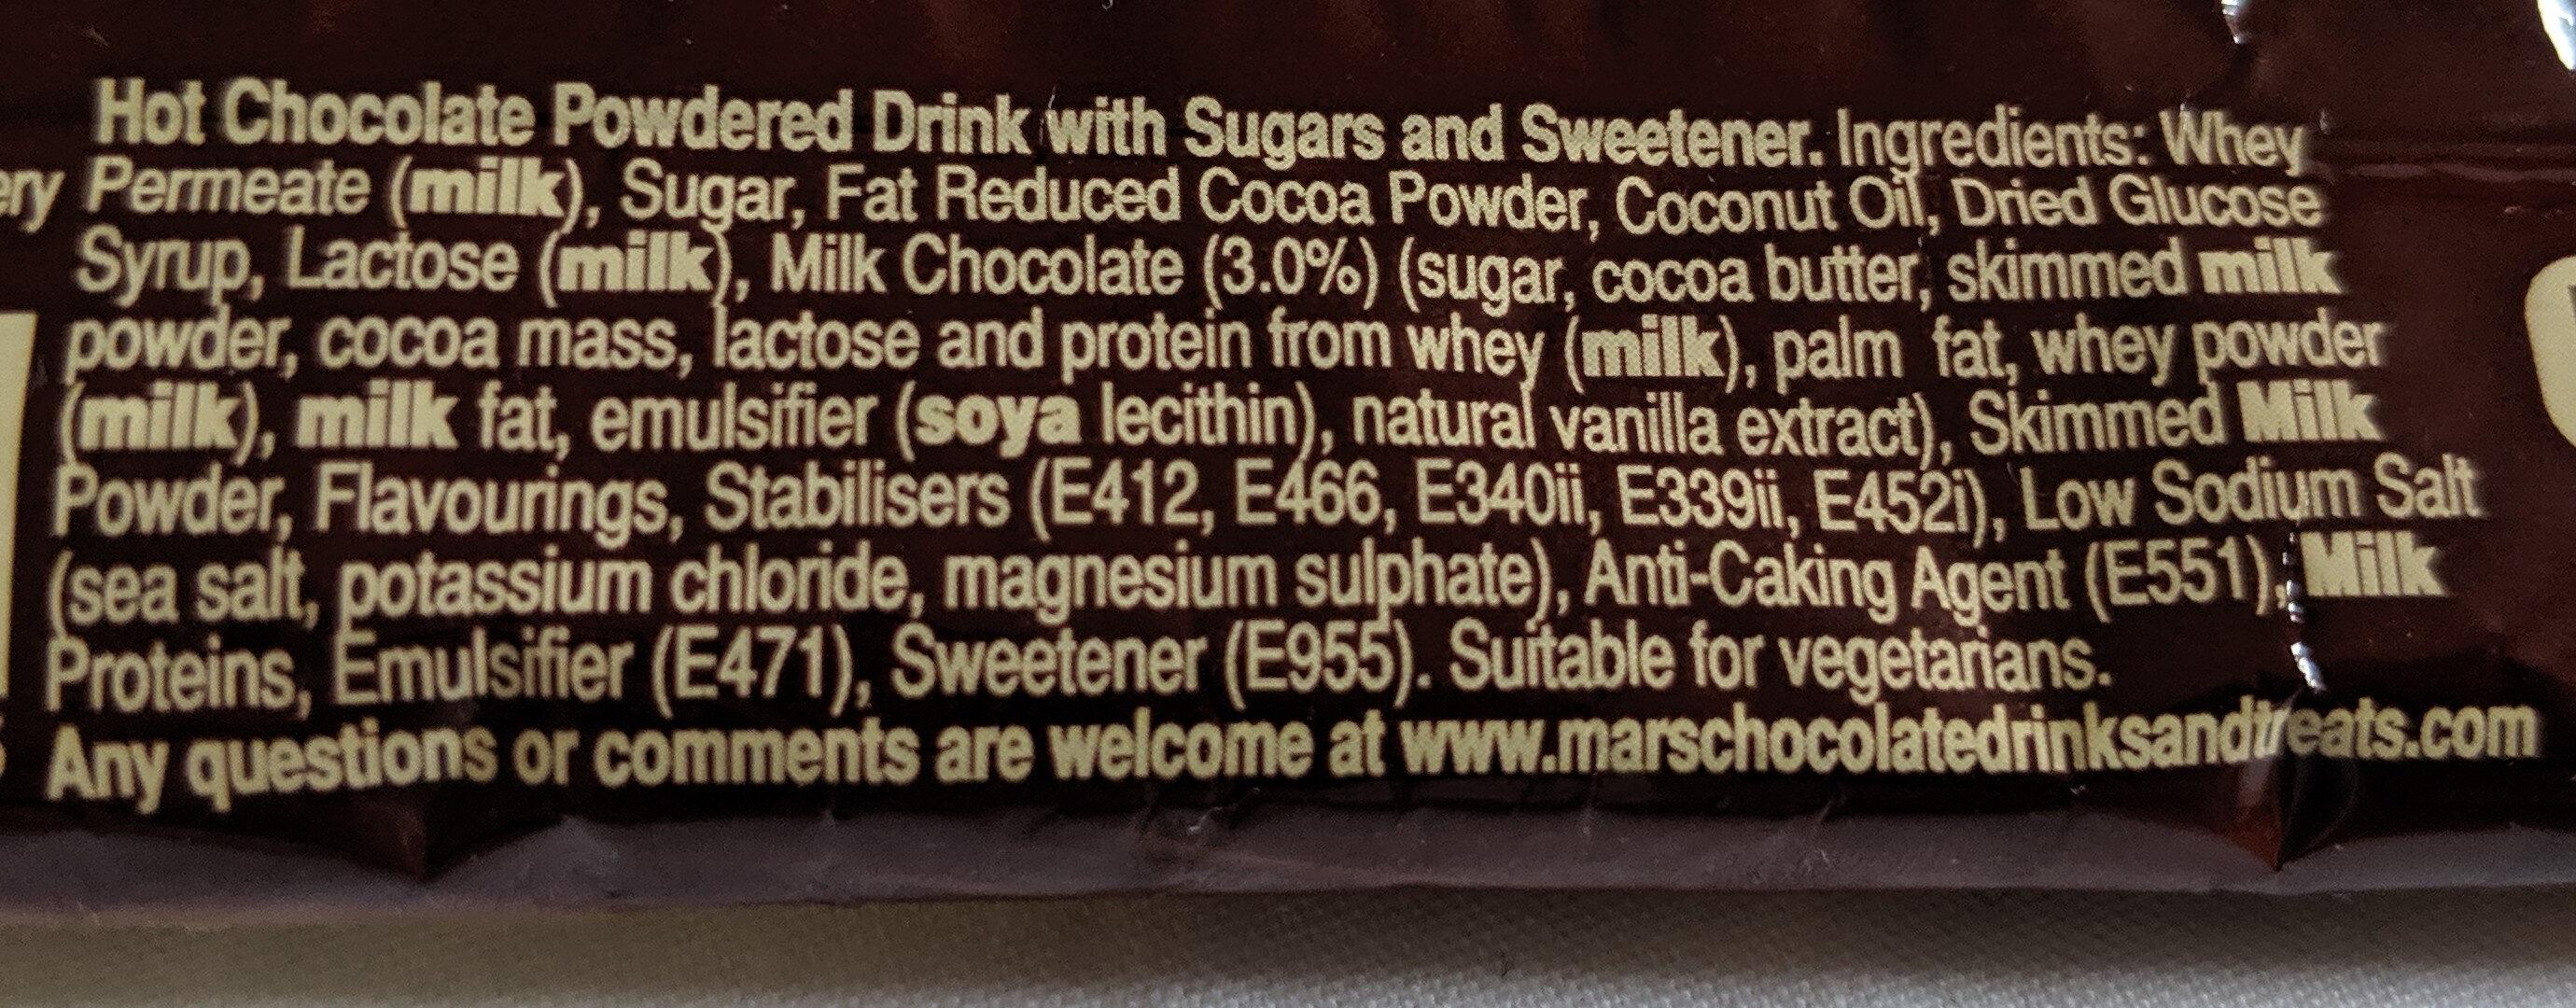 Galaxy Instant Hot Chocolate - Ingredients - en